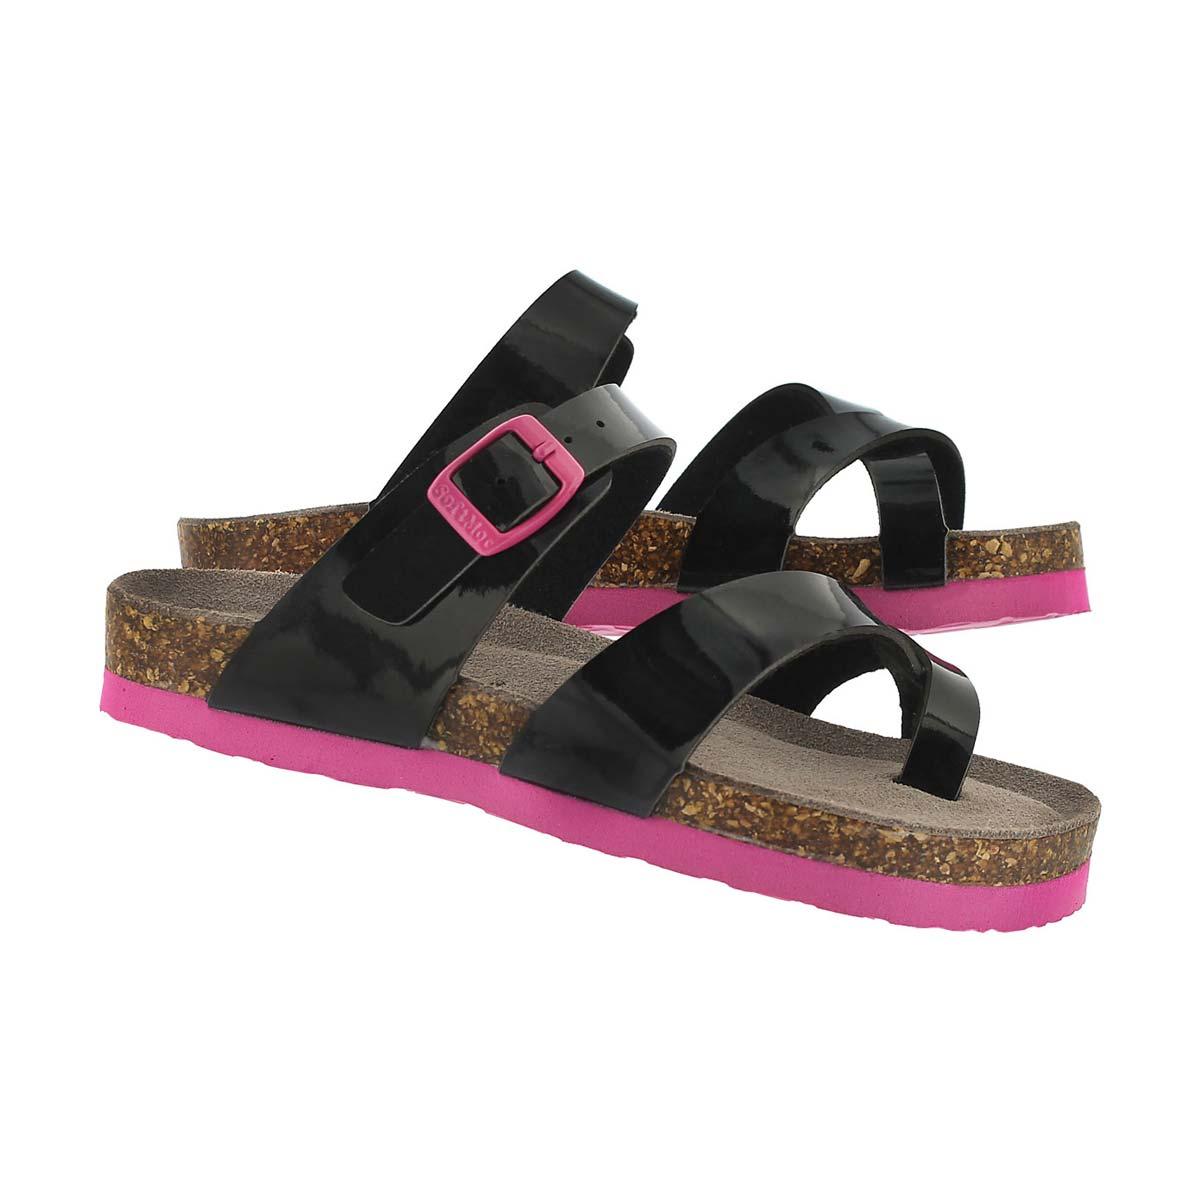 Sandale Alicia, cuir verni noir, filles